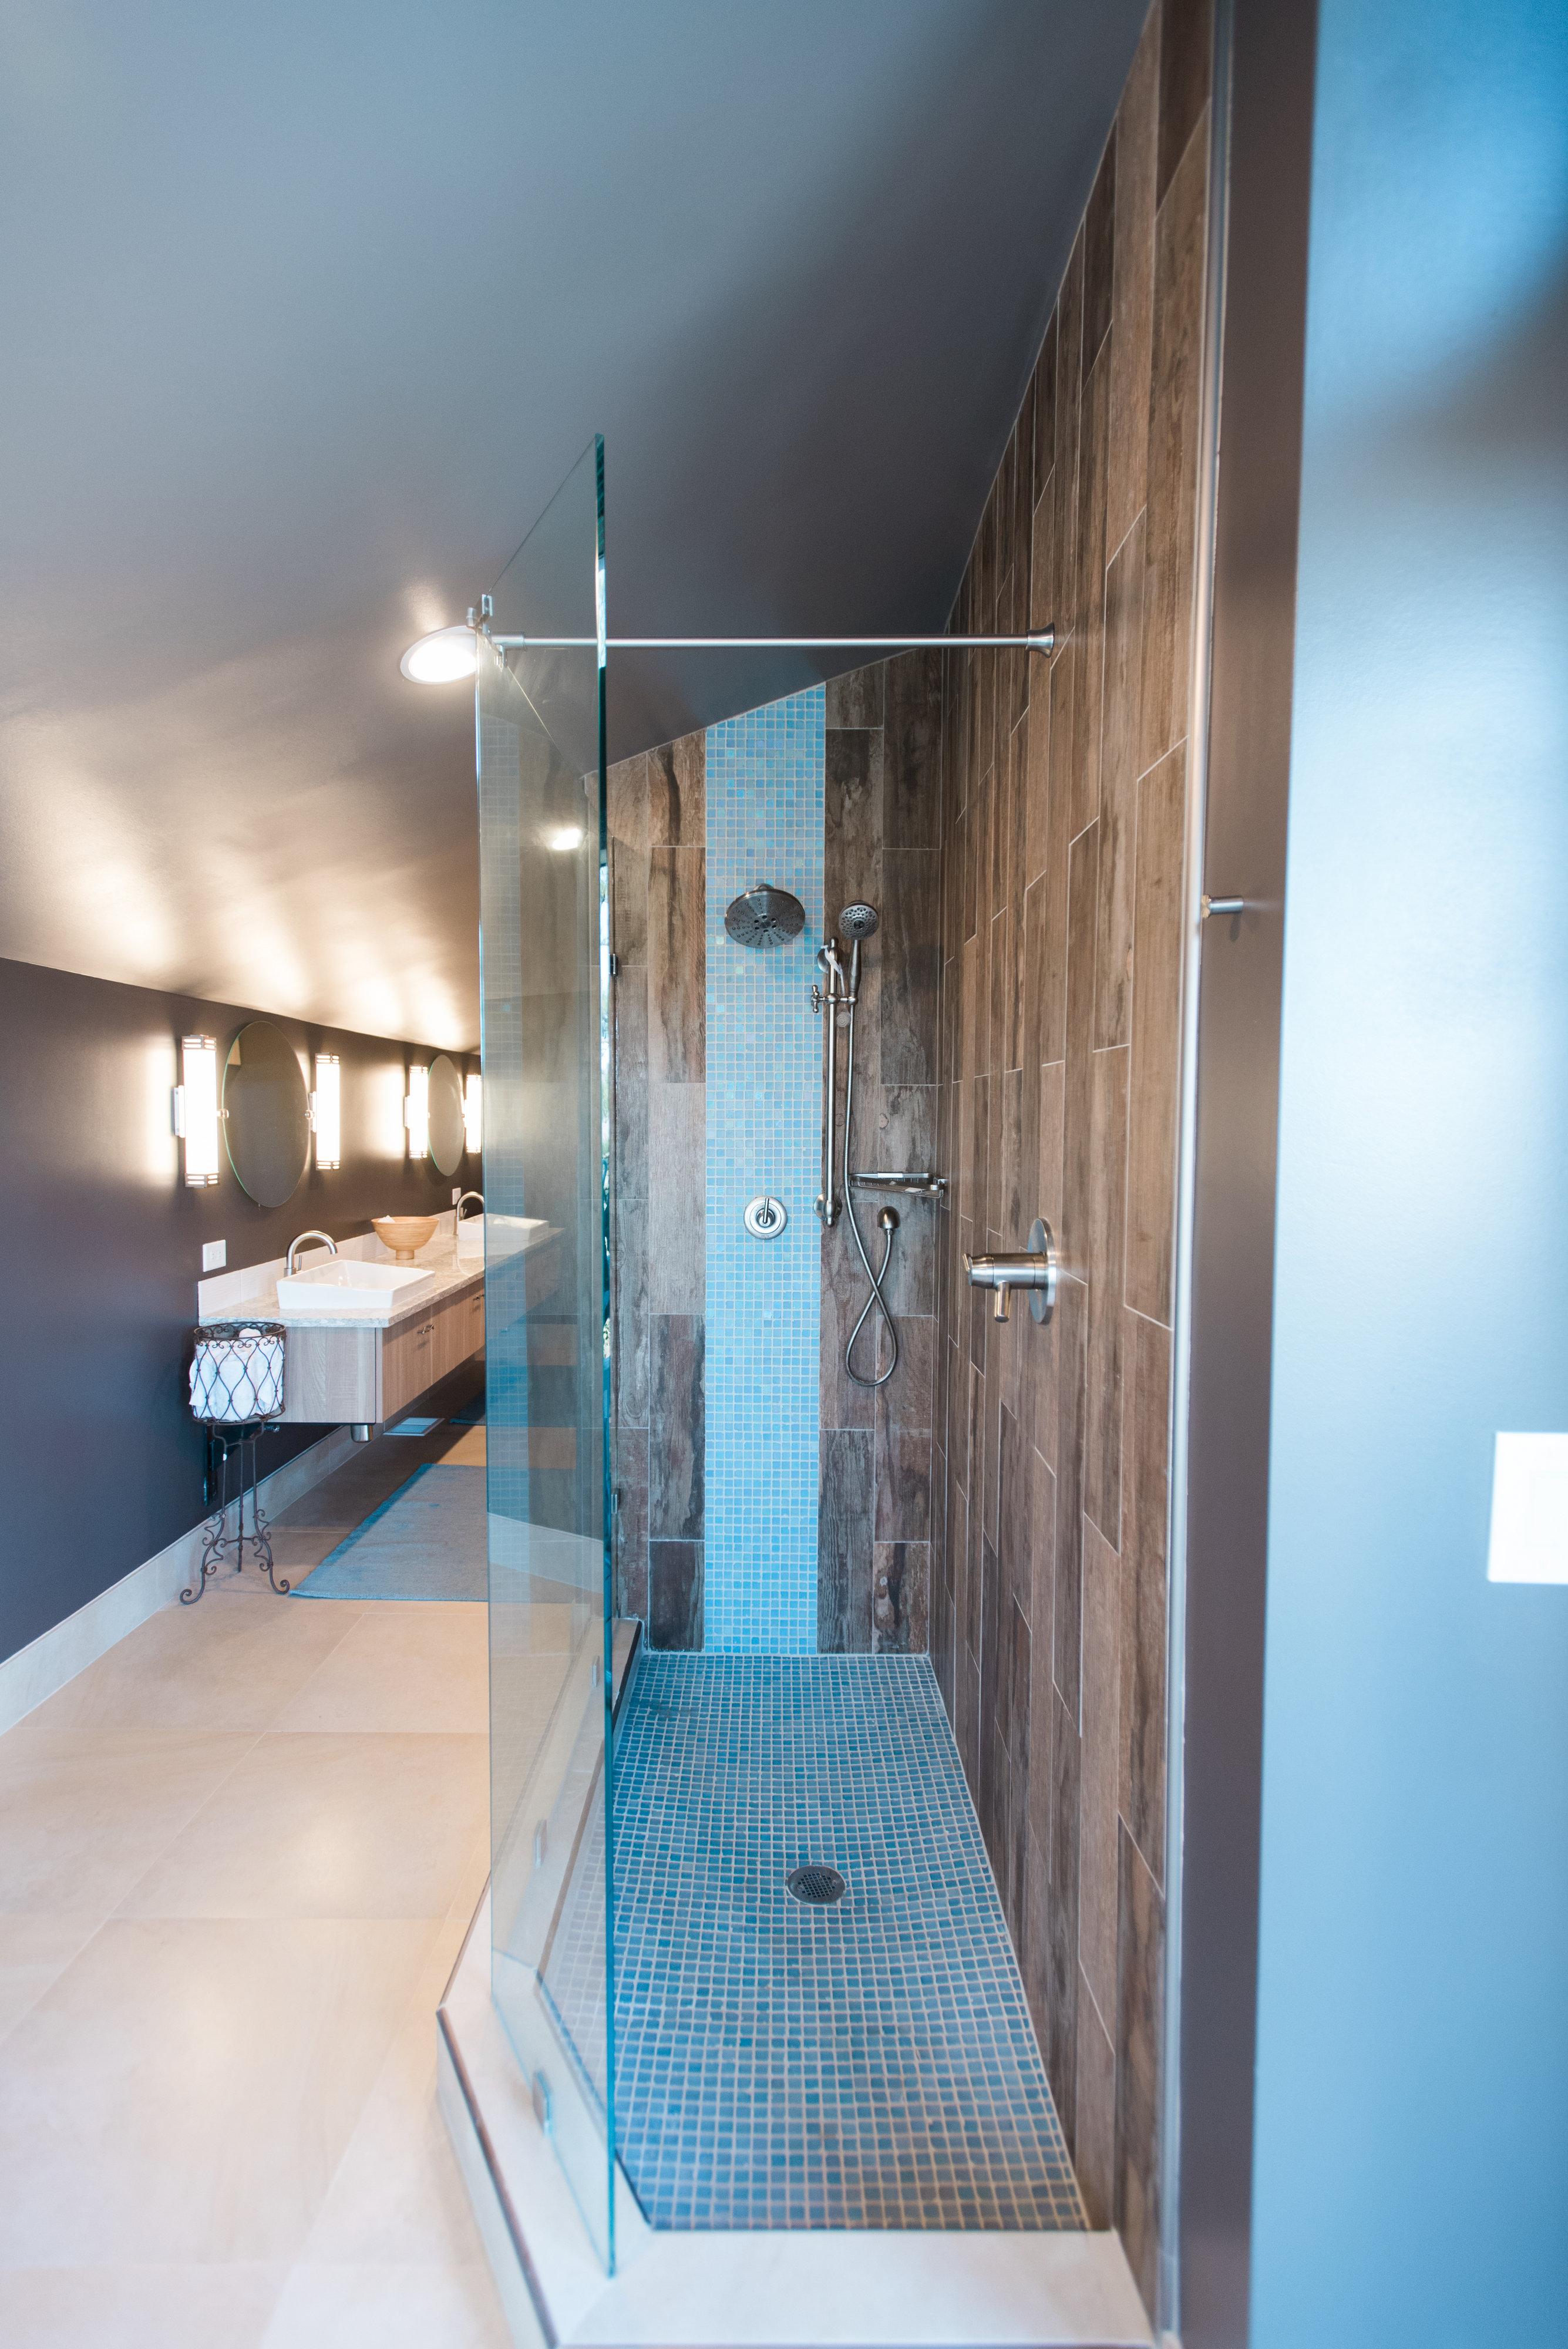 Bathroom Reconstruction - Remodel Republic